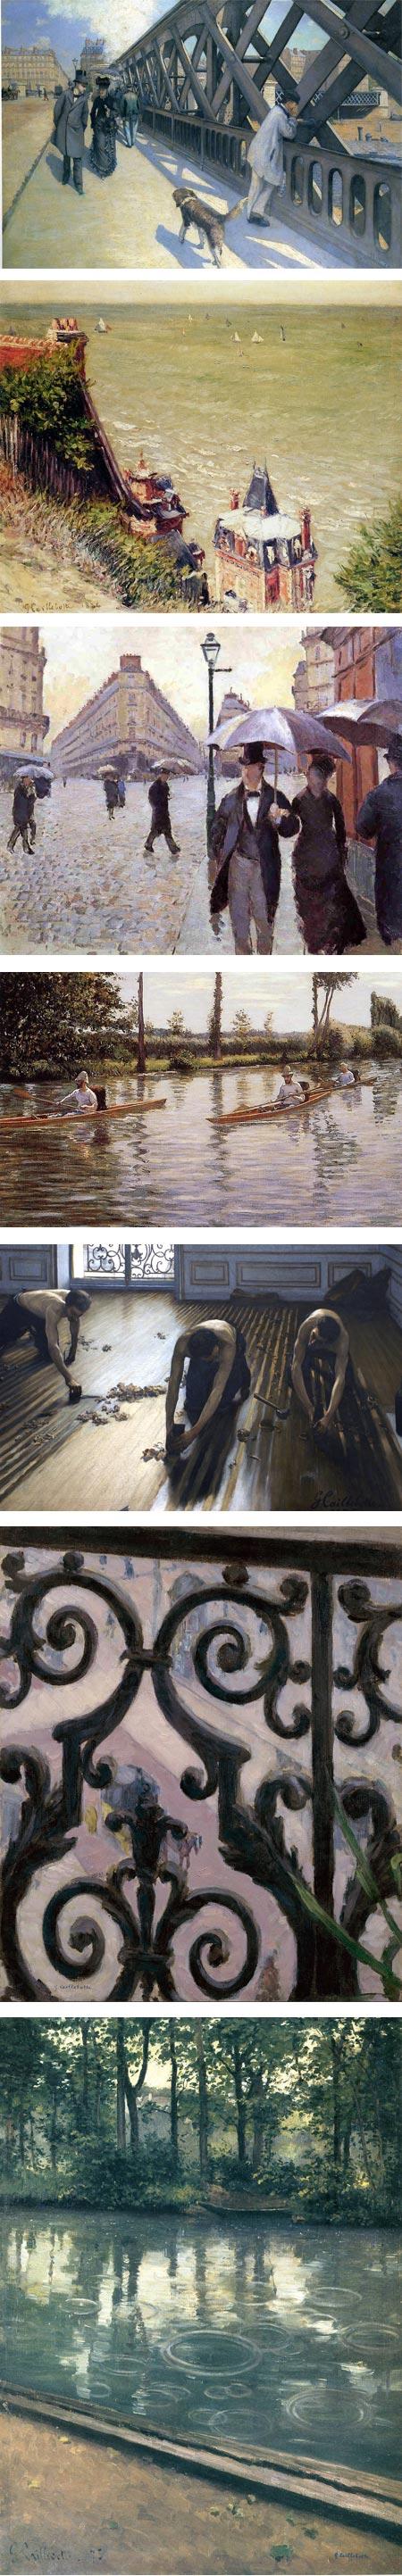 Gustave Caillebotte at Schirn Kunsthalle Frankfurt